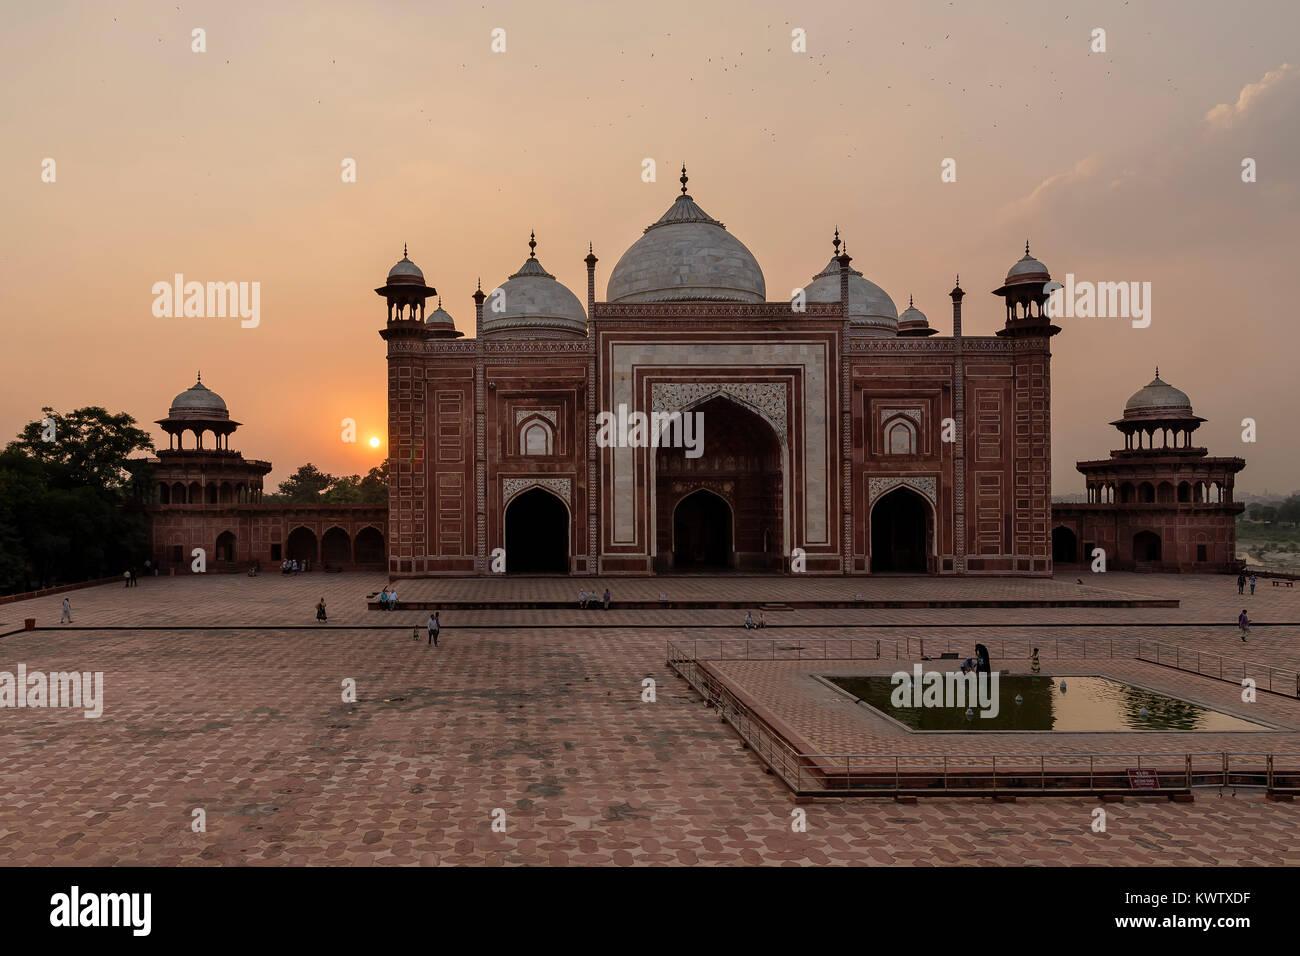 La UAE prohibición contra la mezquita, complejo SUNSET Taj Mahal, Agra, Uttar Pradesh, India Imagen De Stock